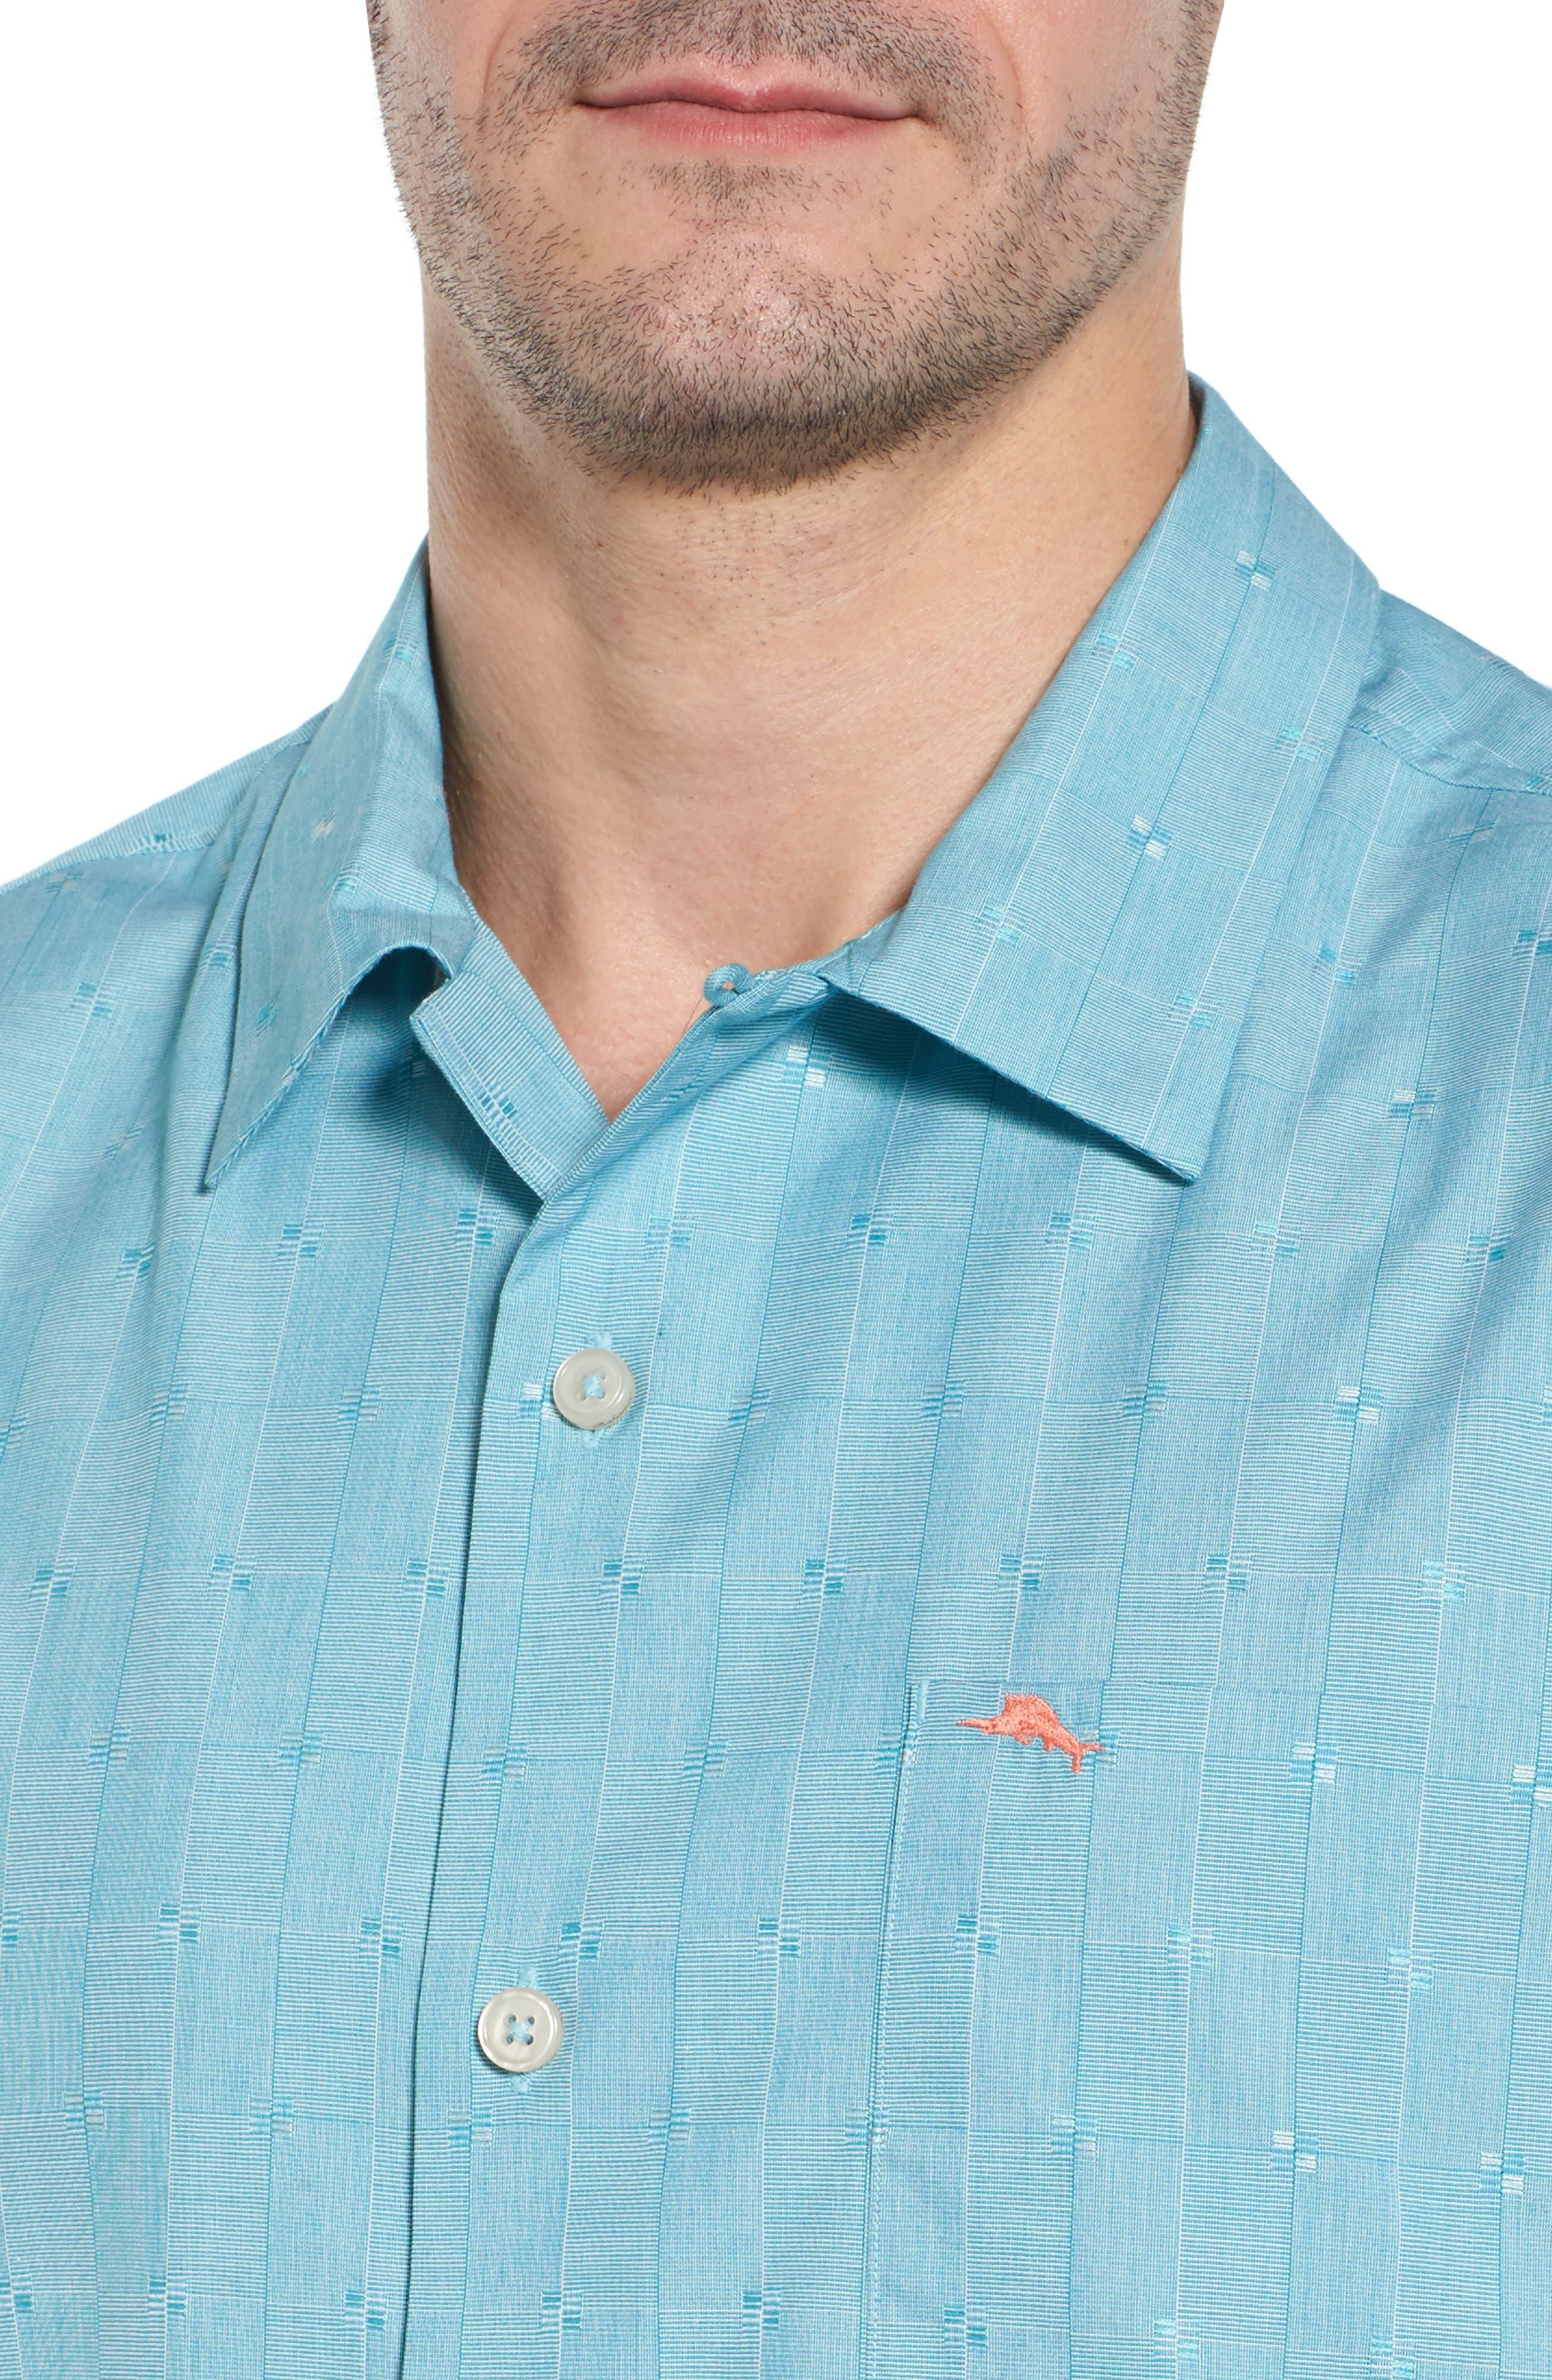 Cypress Sands Camp Shirt,                             Alternate thumbnail 4, color,